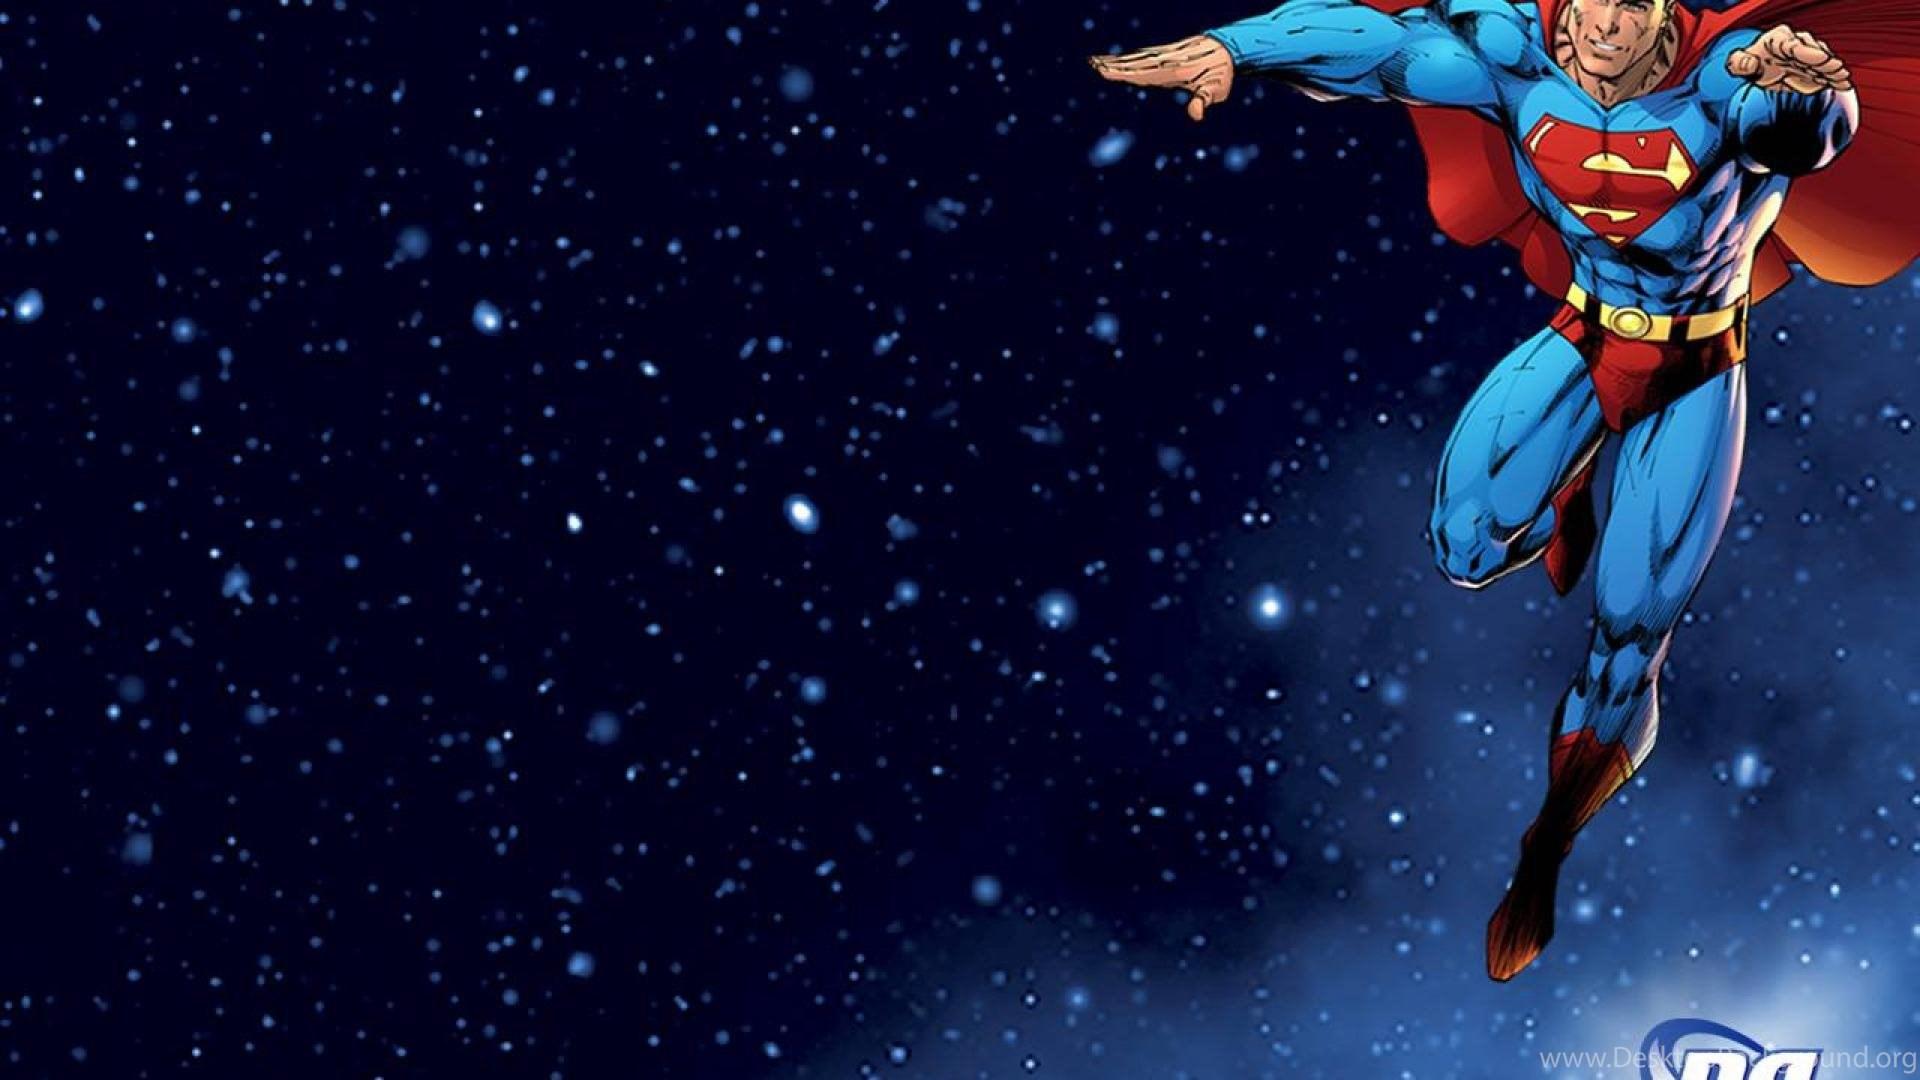 Dc Comics Superman Wallpapers 2 Desktop Background